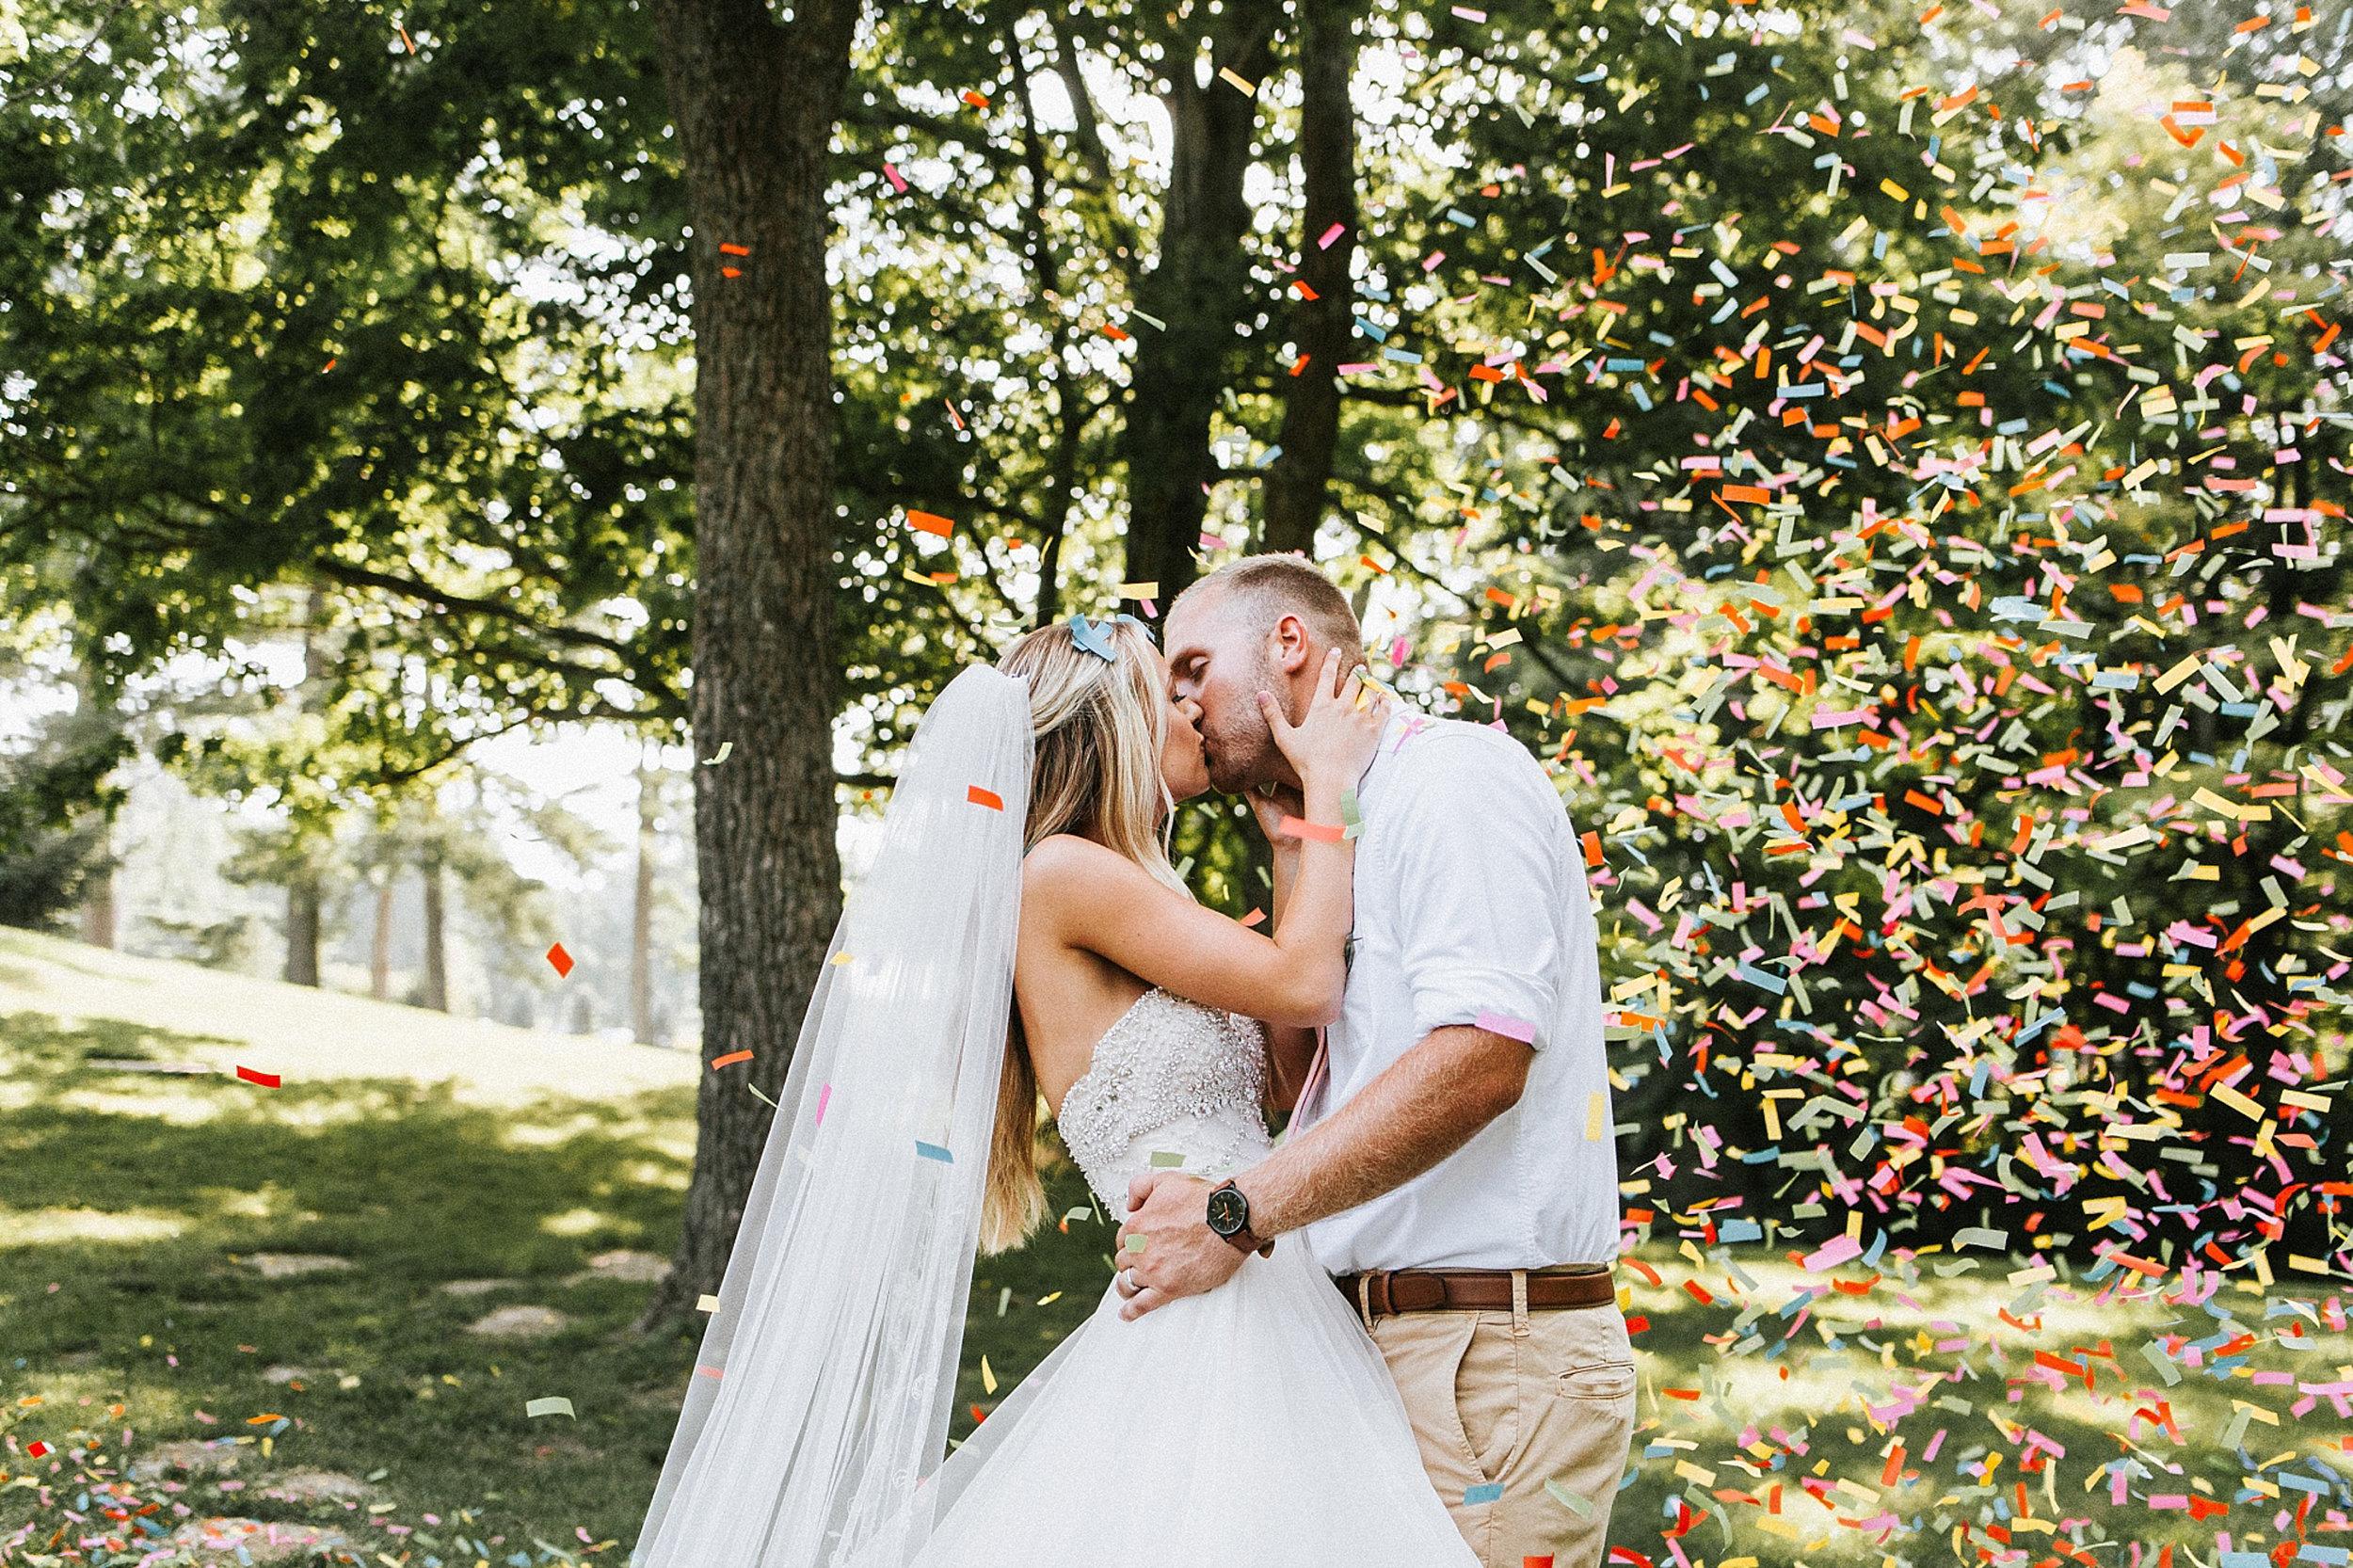 Brooke Townsend Photography - Cincinnati Wedding Photographer (98 of 153).jpg